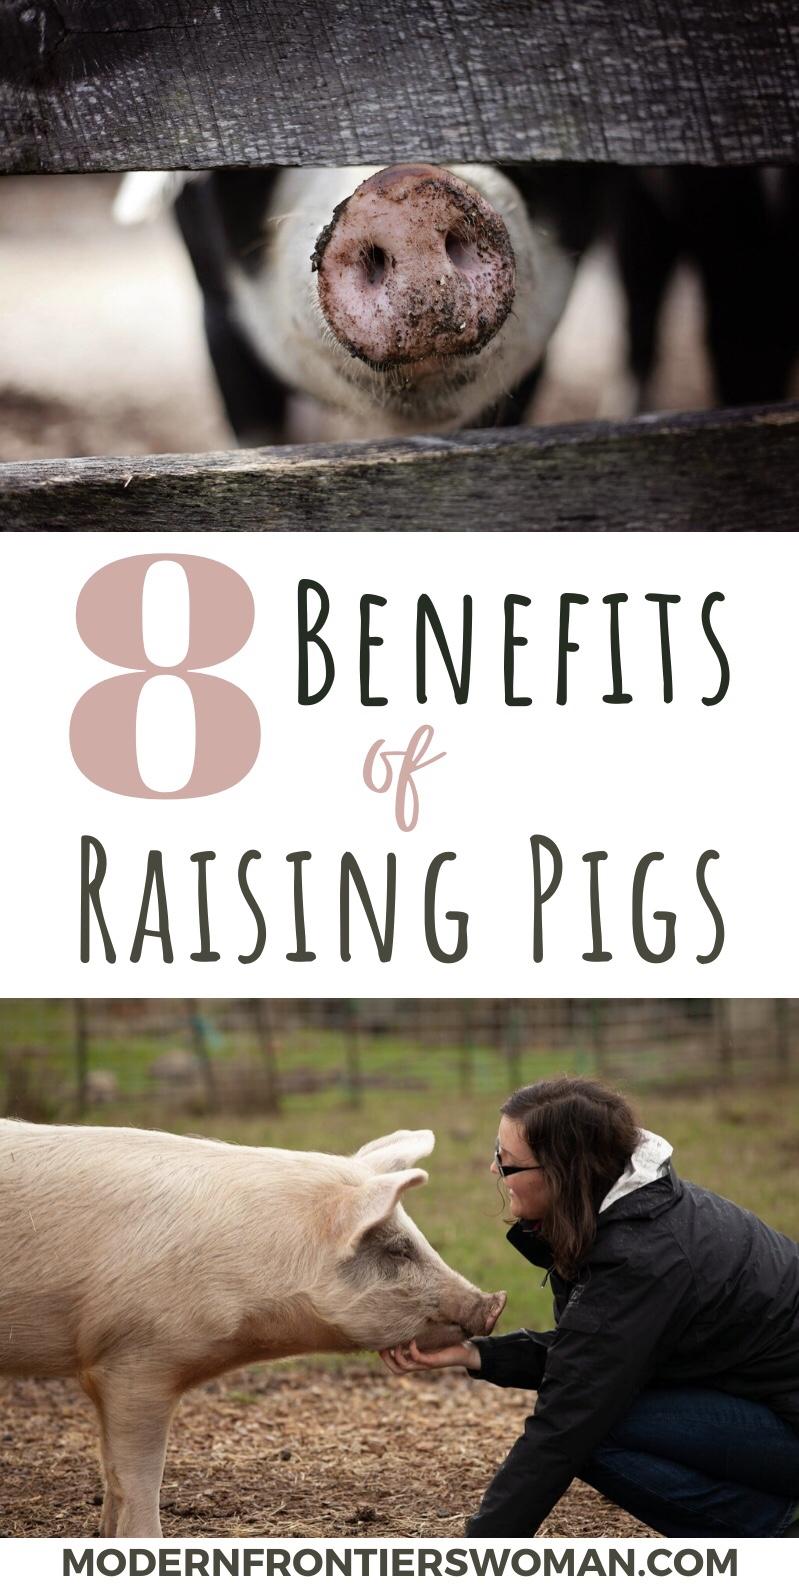 8 Benefits of Raising Pigs